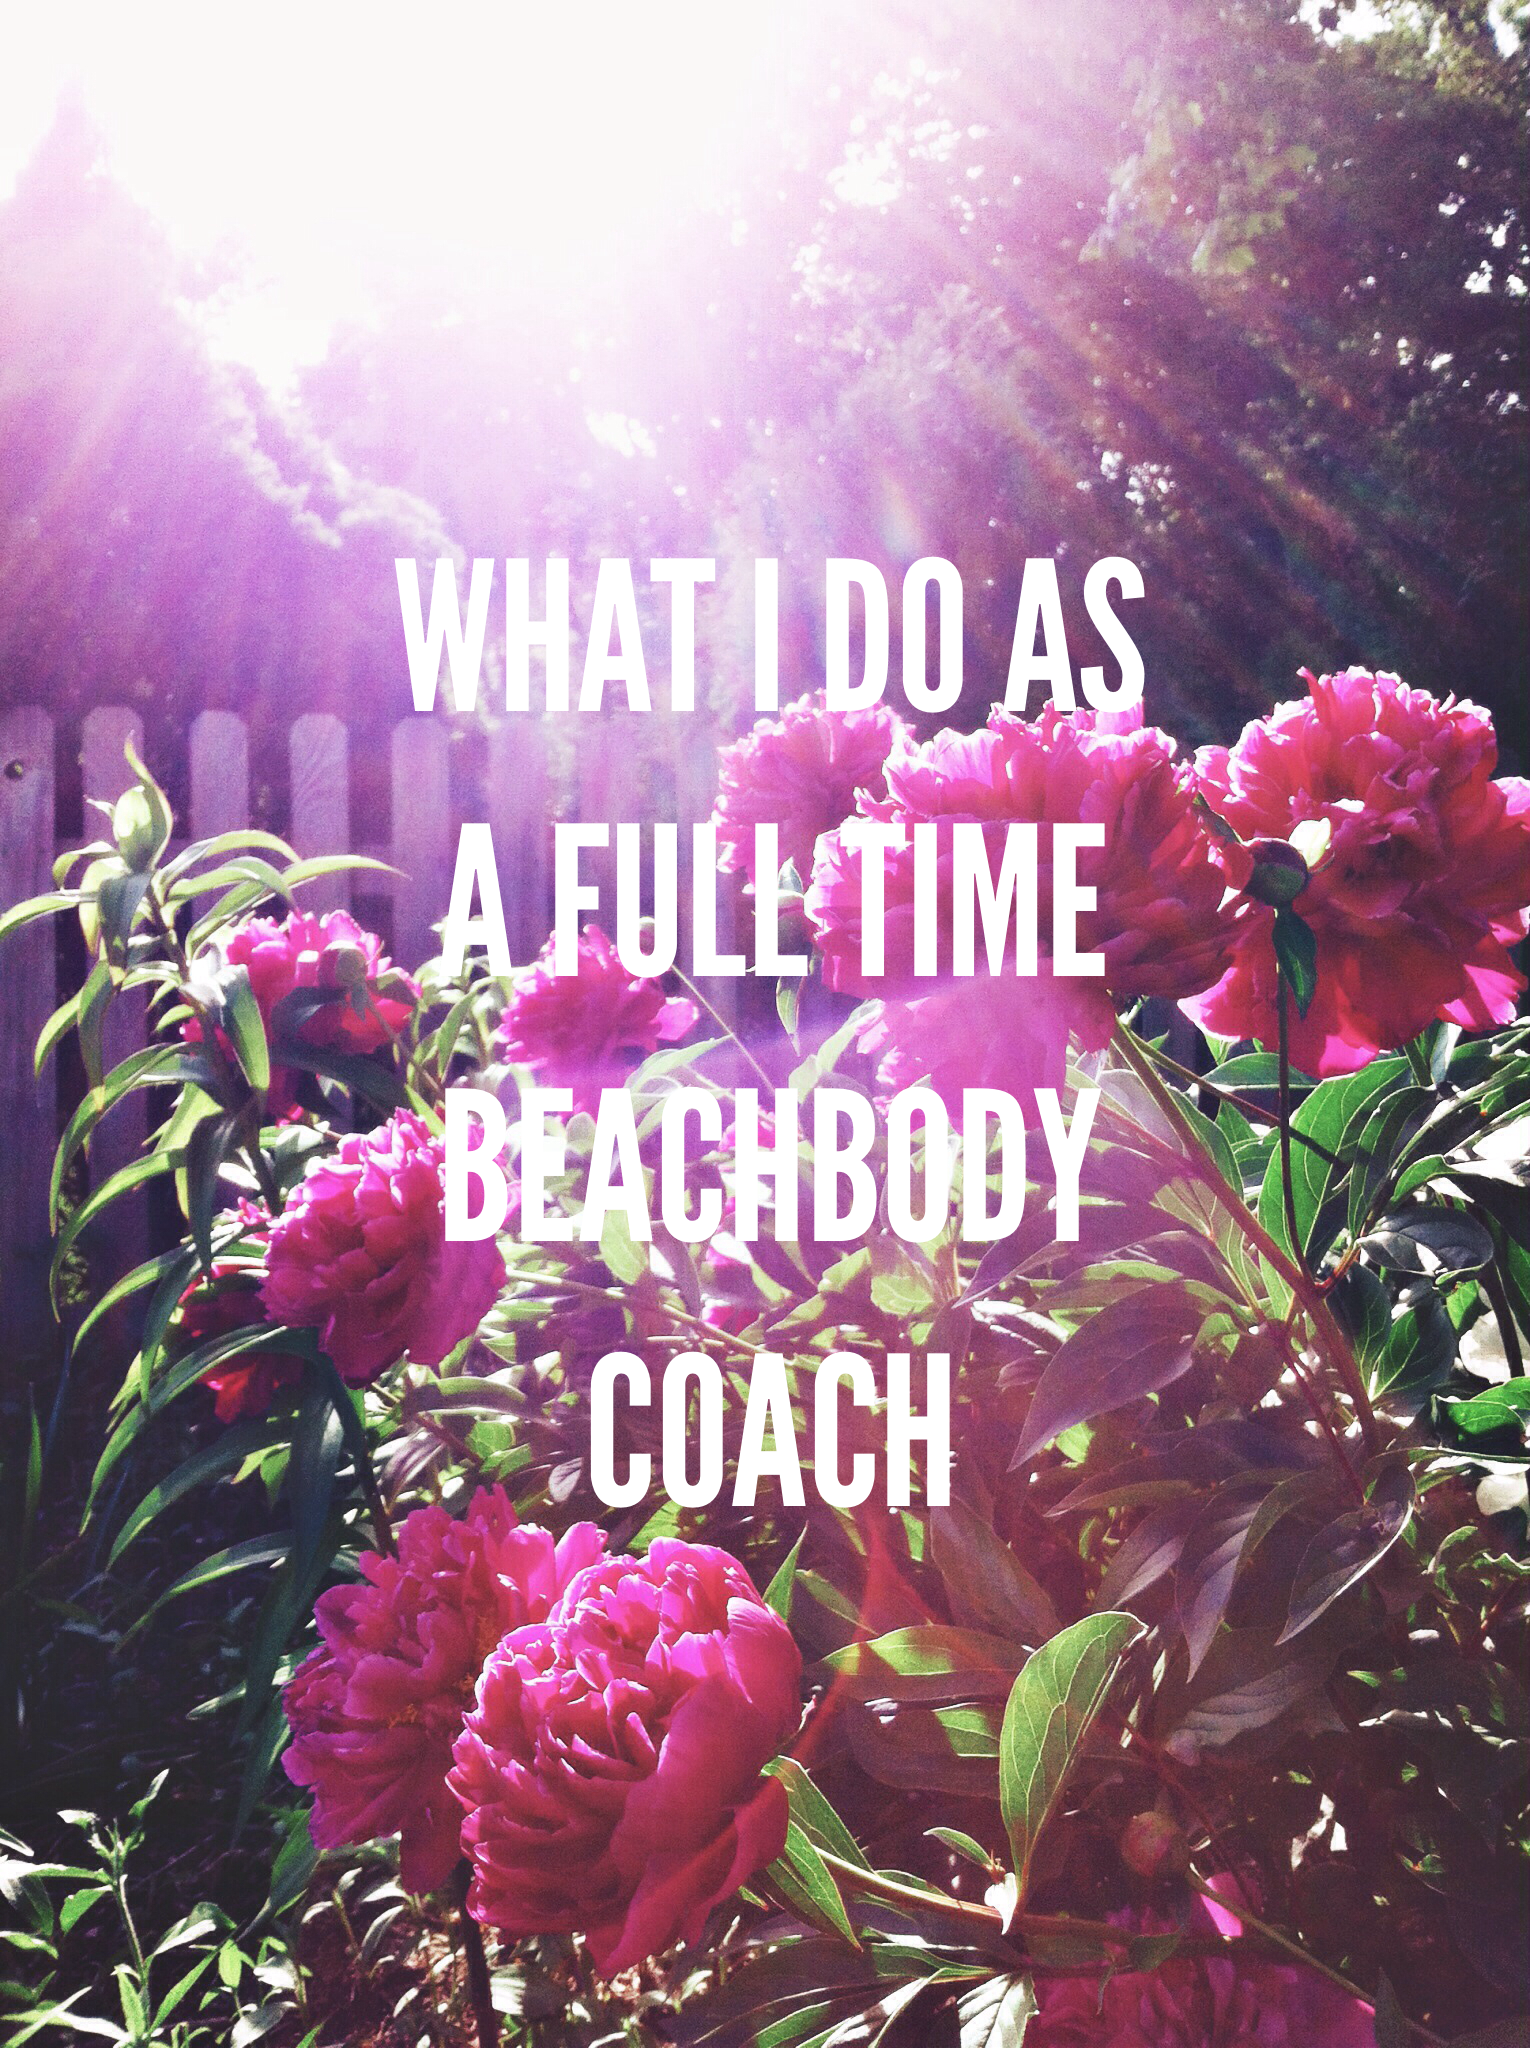 What I do as a full time Beachbody coach